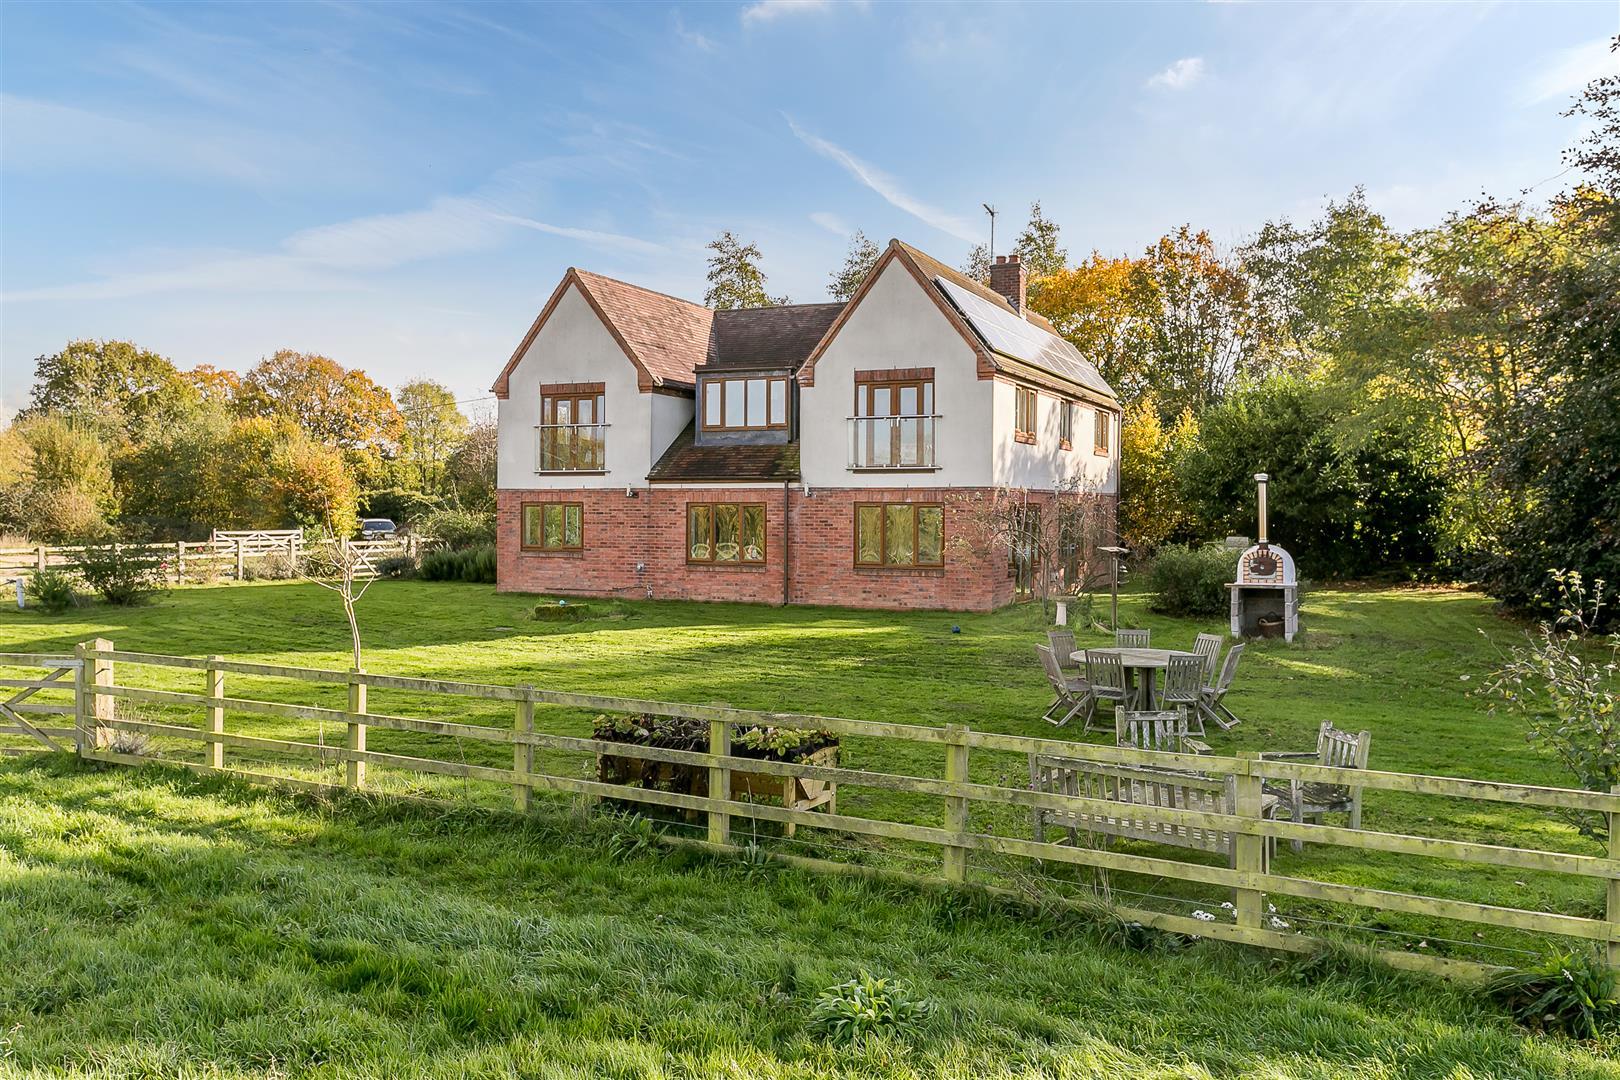 £850,000 - Rugby, Warwickshire - 4 bedrooms